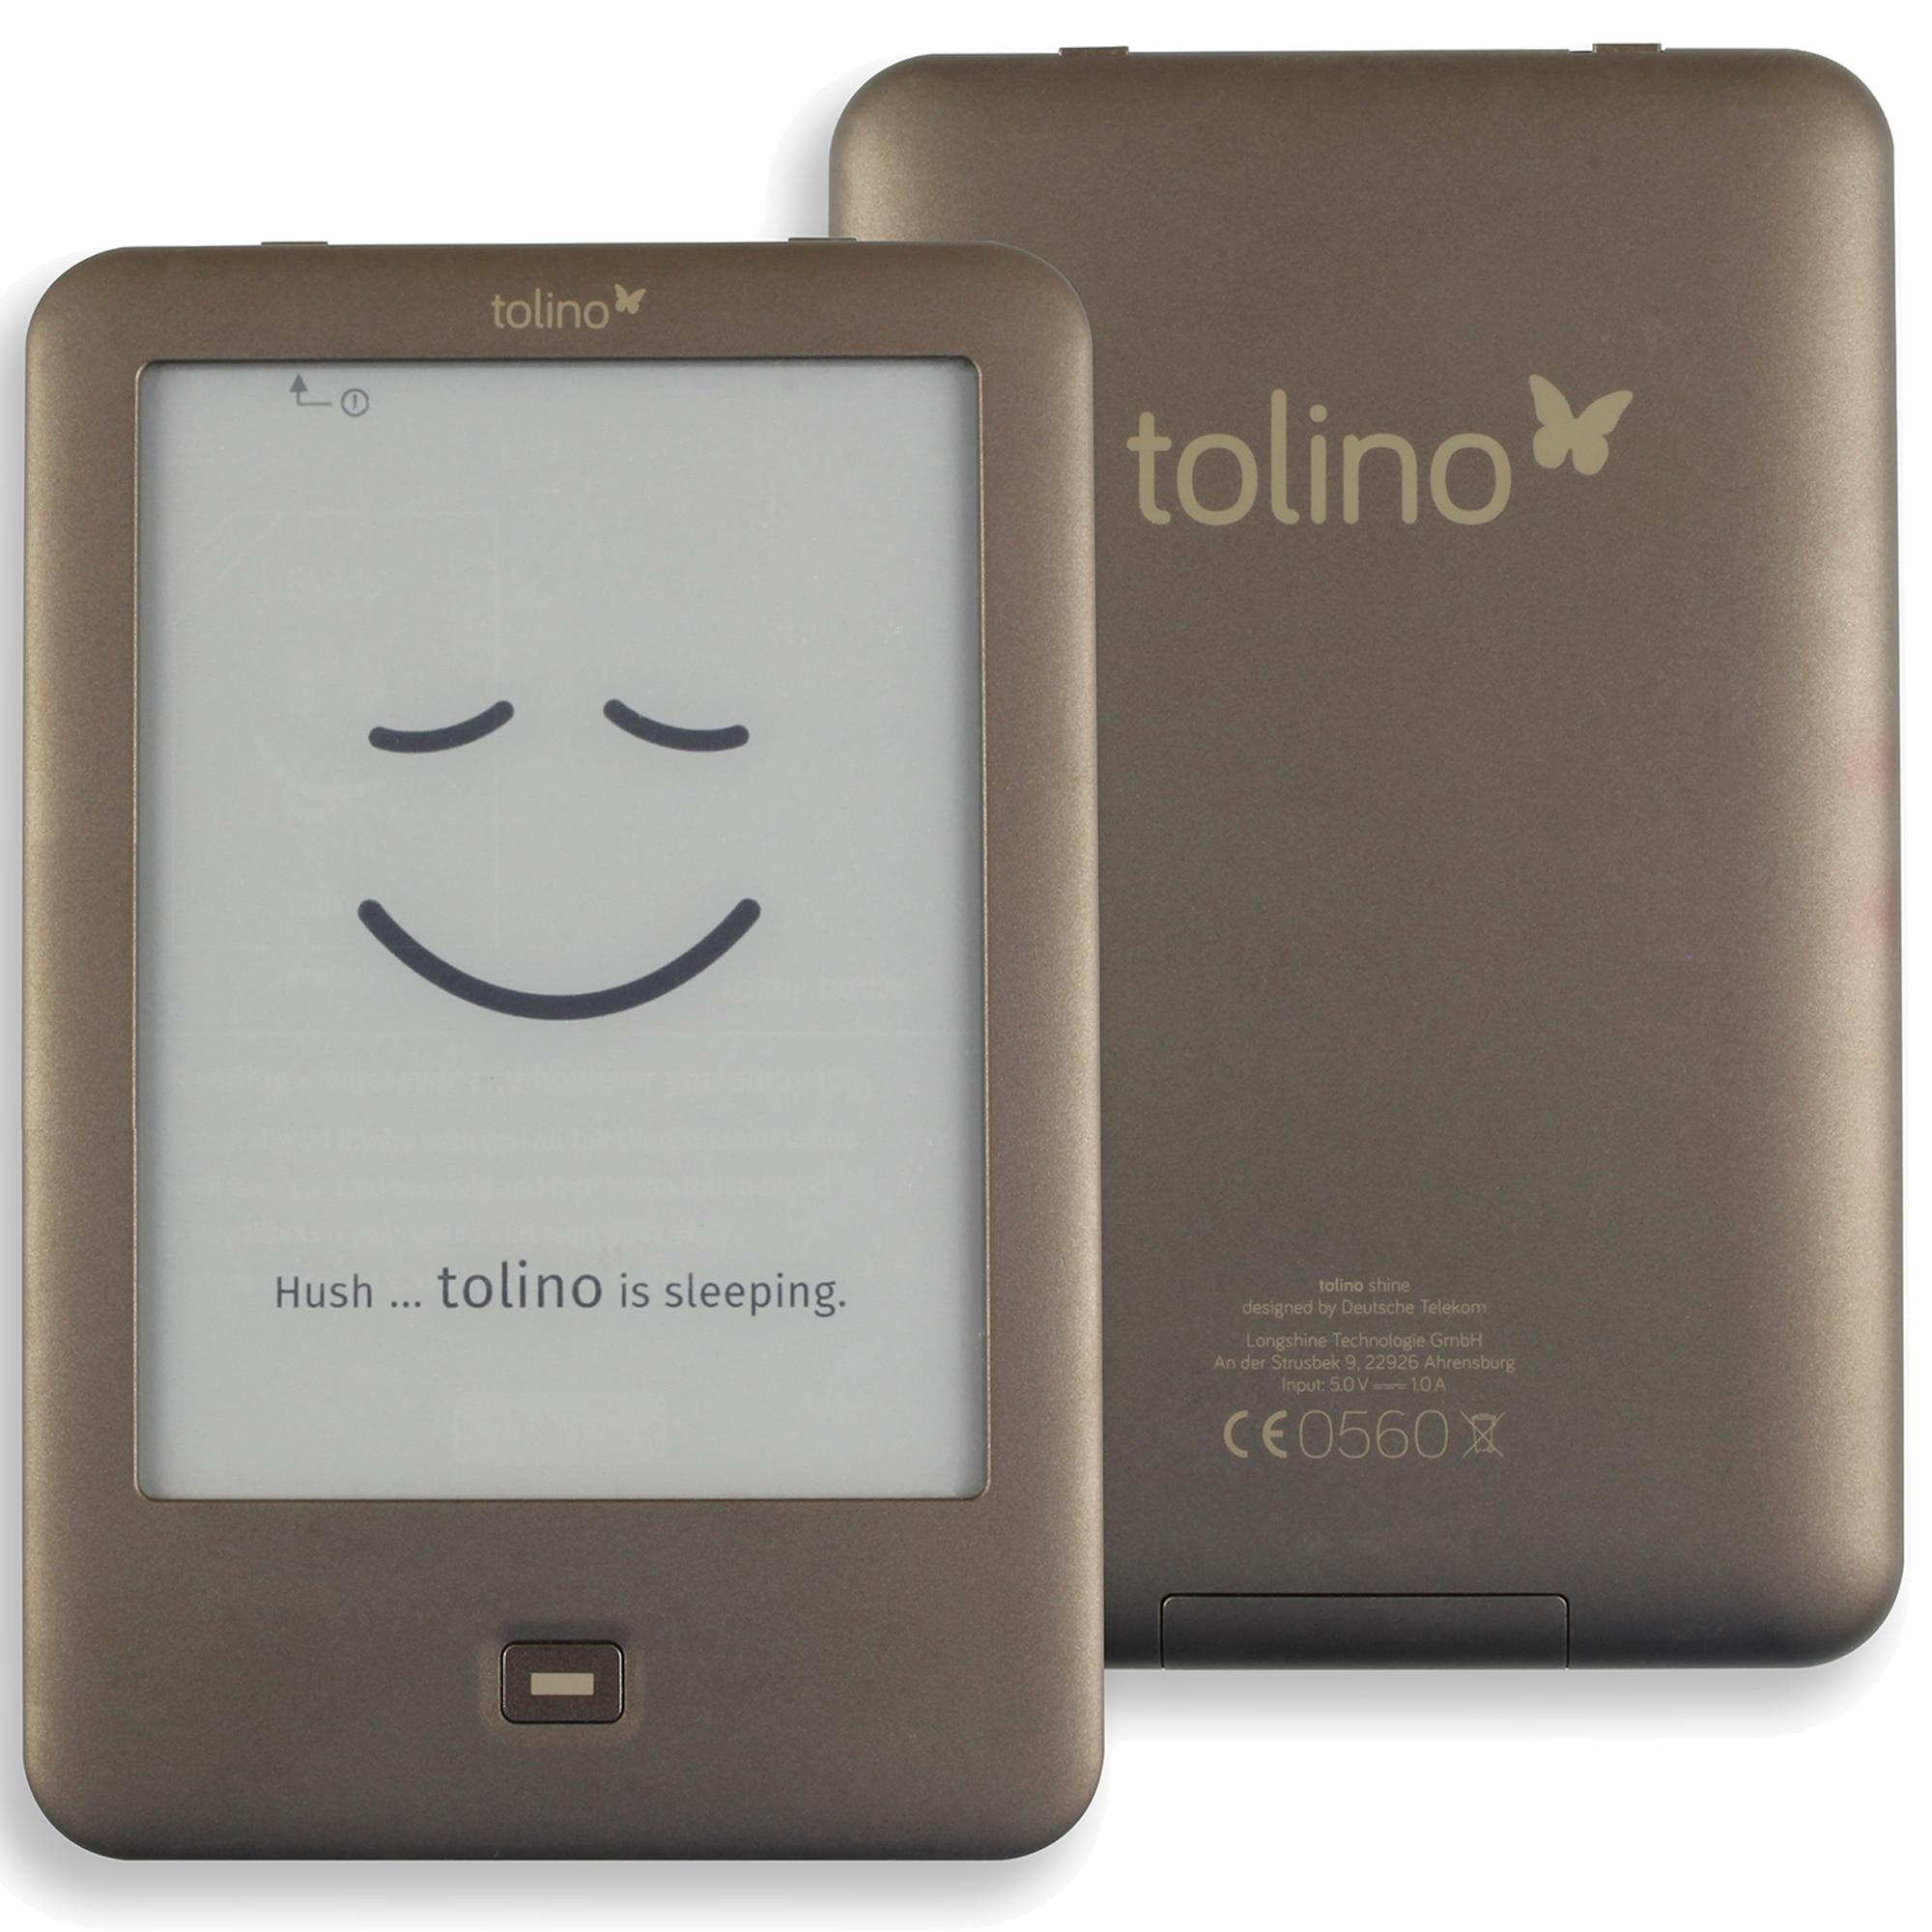 Built in Light e Book Reader WiFi ebook Tolino Shine e ink 6 inch  Touch Screen 1024x758 electronic Book ReadereBook Reader   -